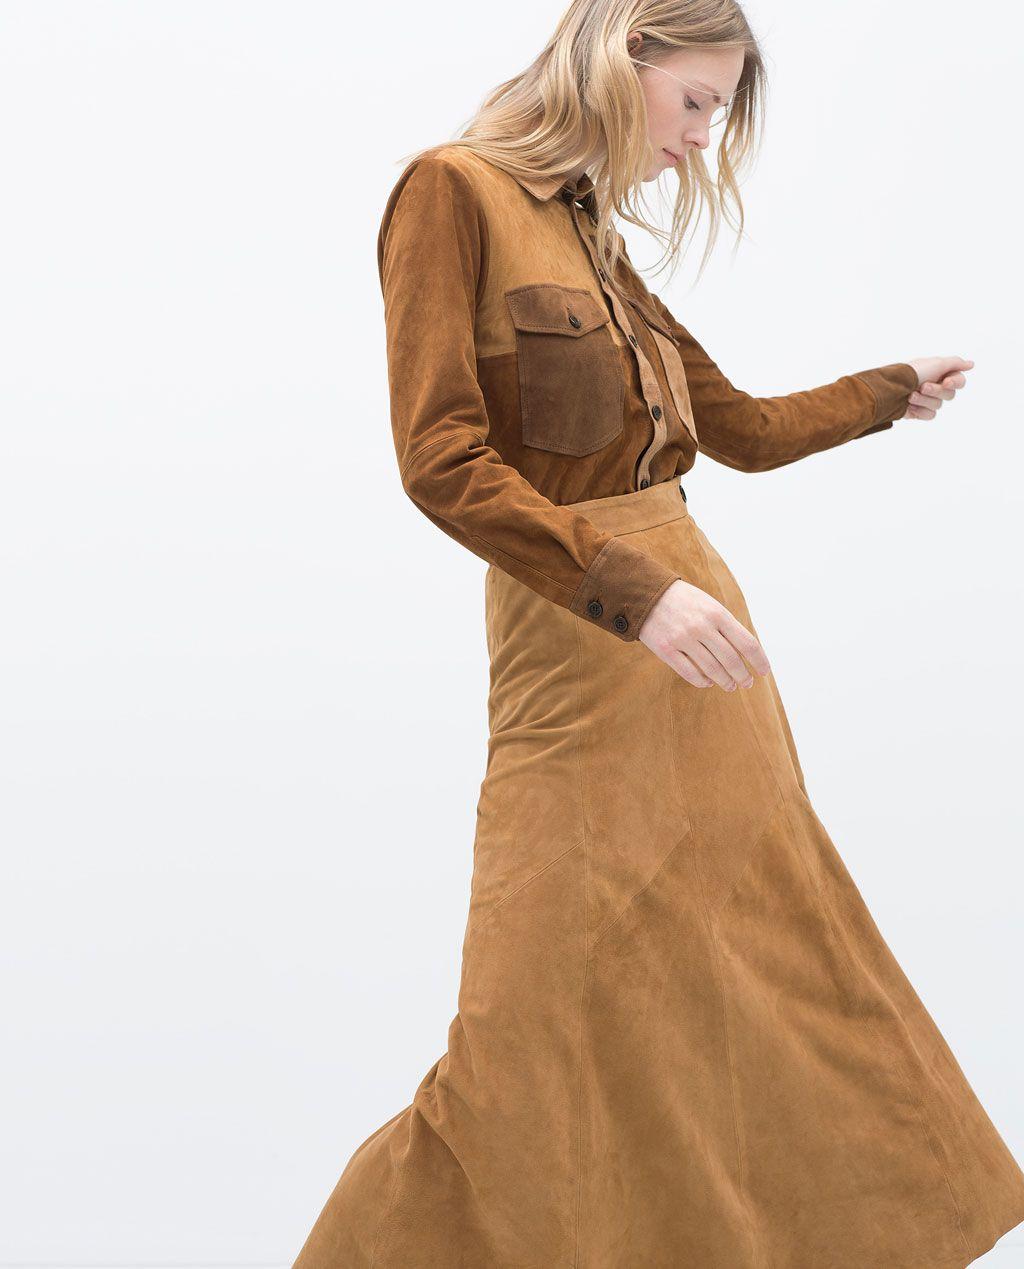 ZARA - WOMAN - LONG SUEDE SKIRT 2015 | Style | Pinterest | Suede ...